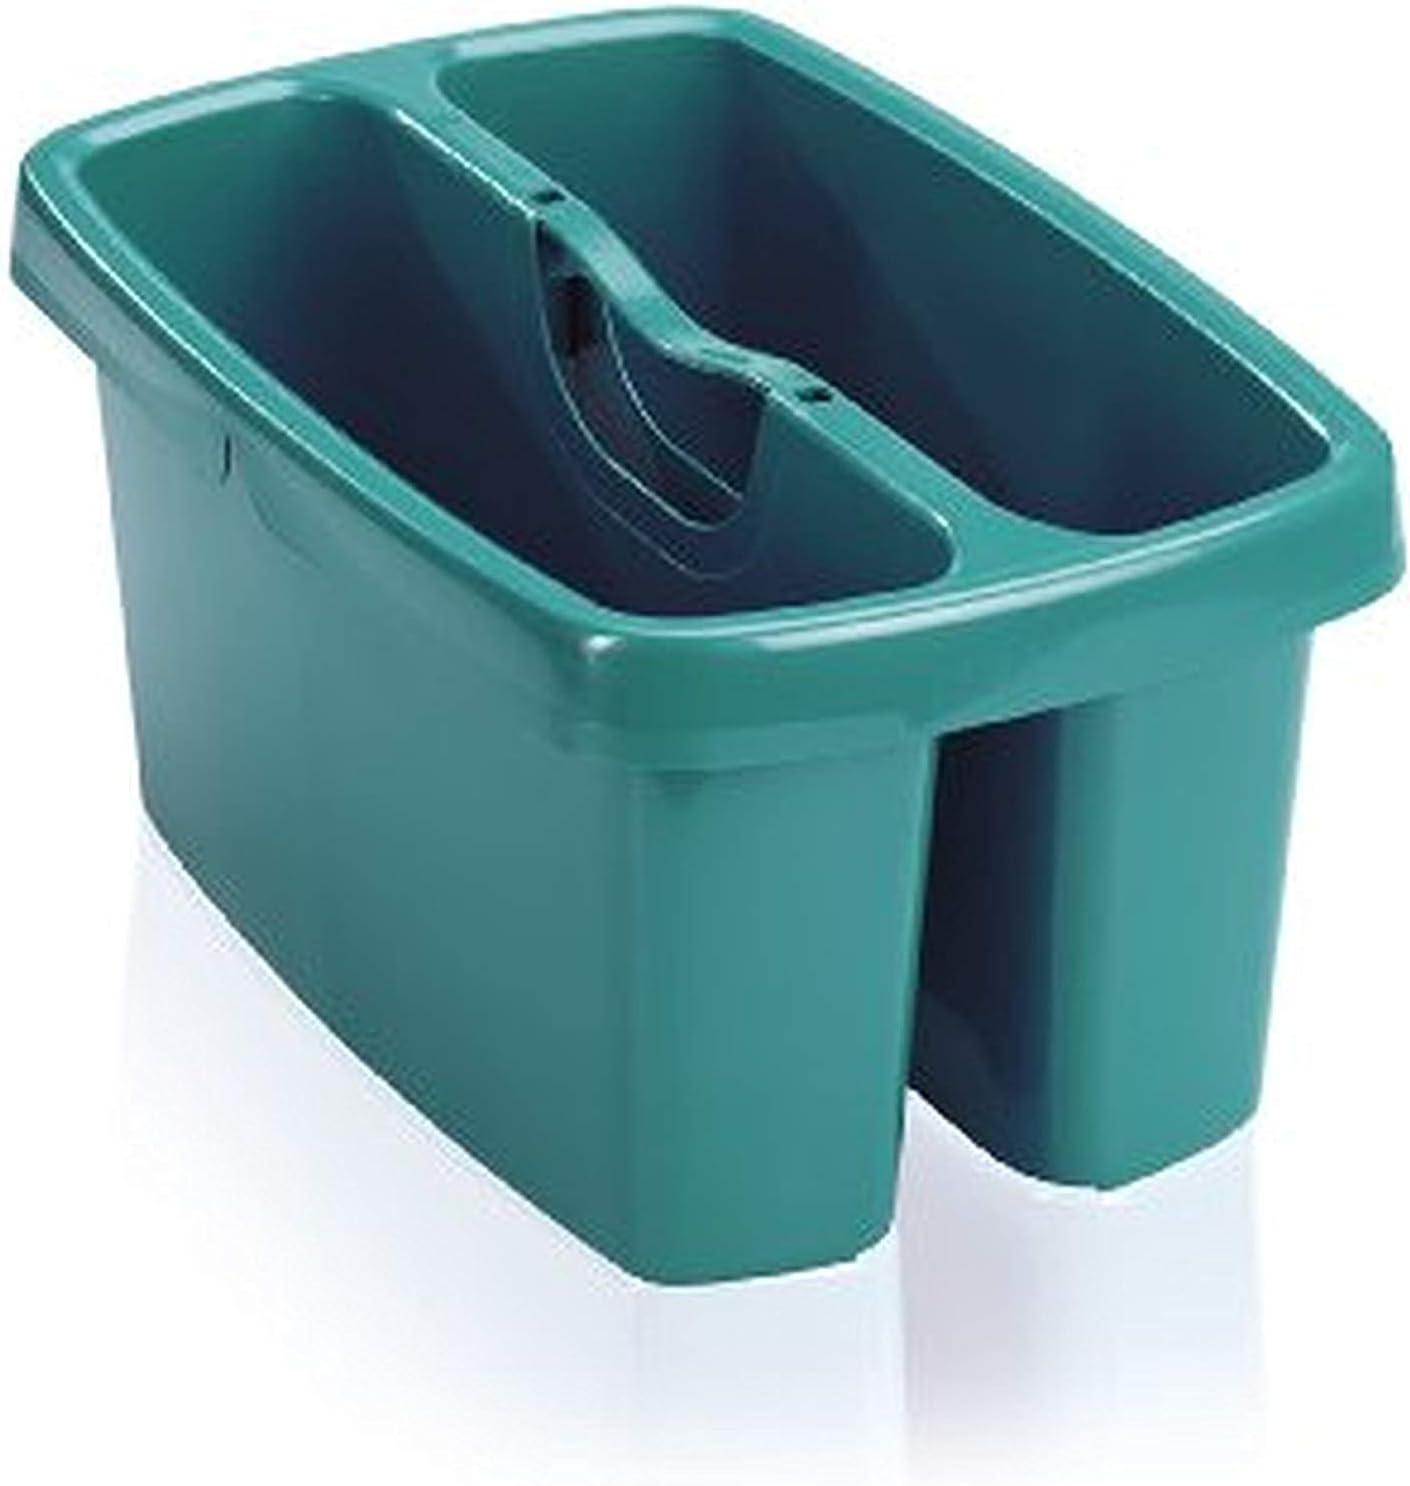 Leifheit Combi Box - Caja para Utensilios de Limpieza de plástico, 36.5x23.6x18.4 cm, Color Verde